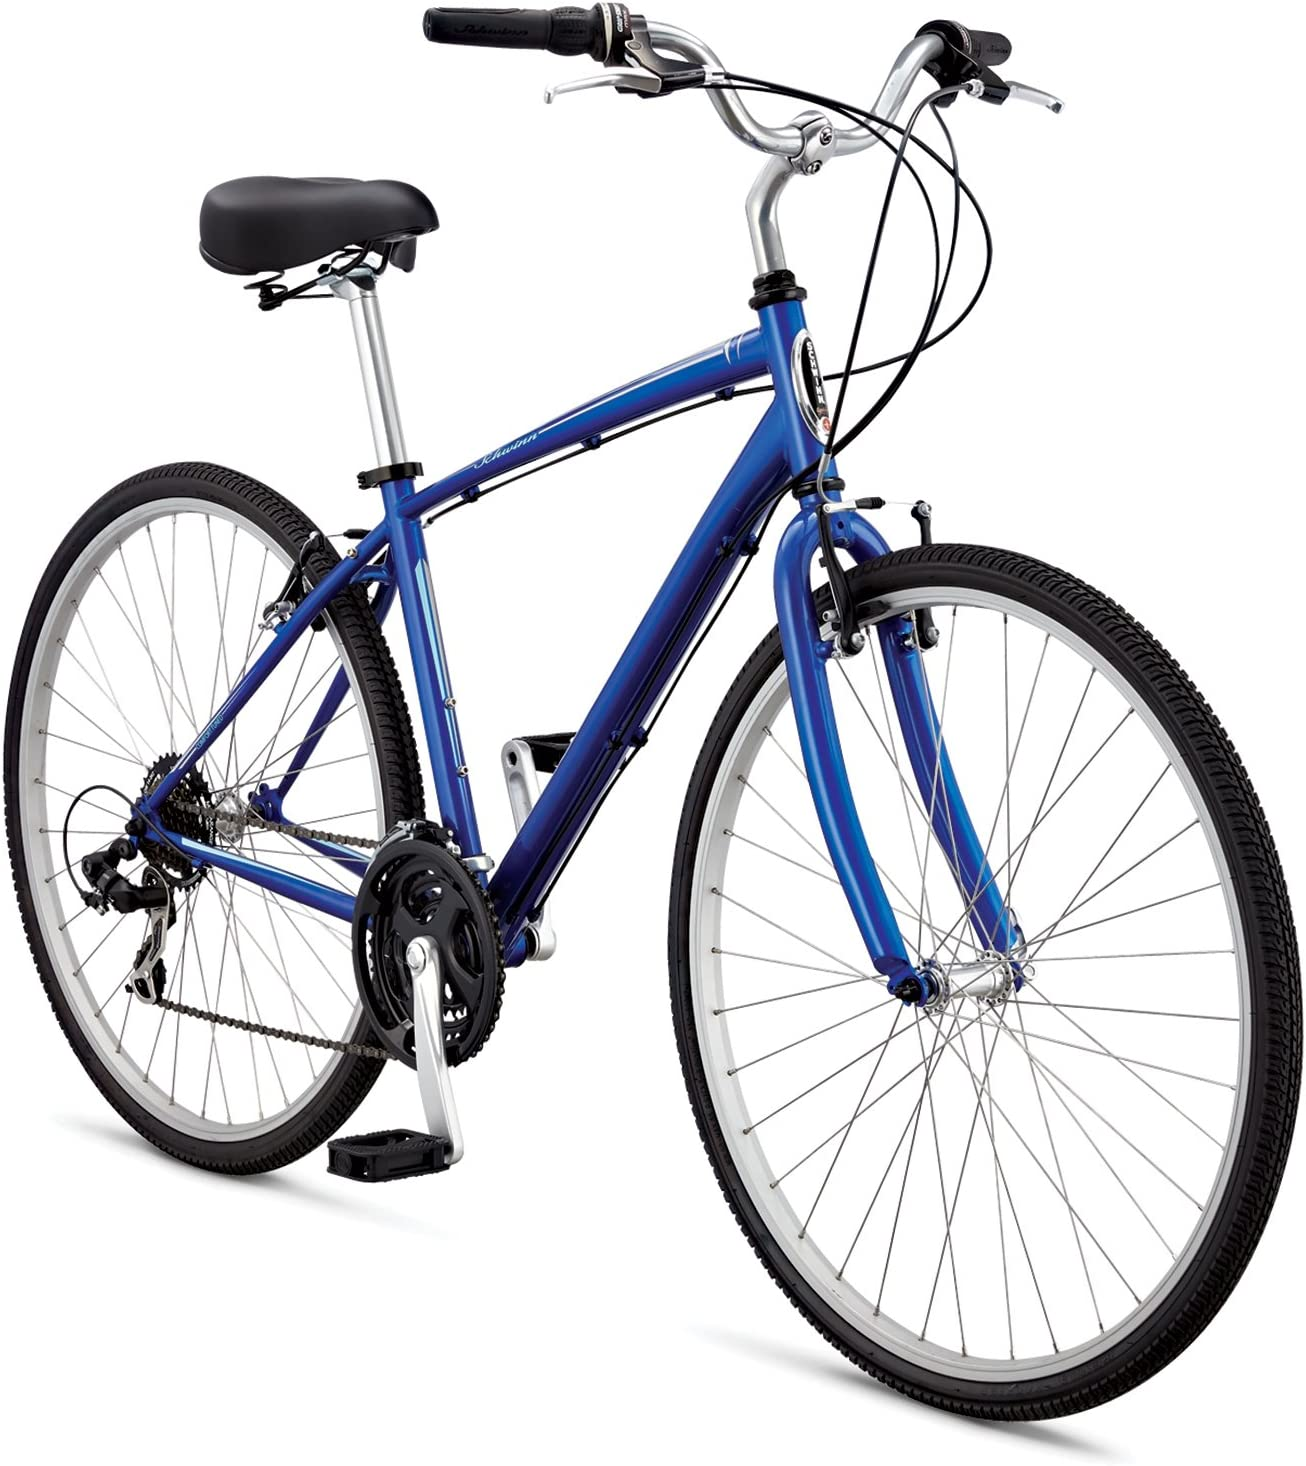 Schwinn Voyager Hybrid Bicycle